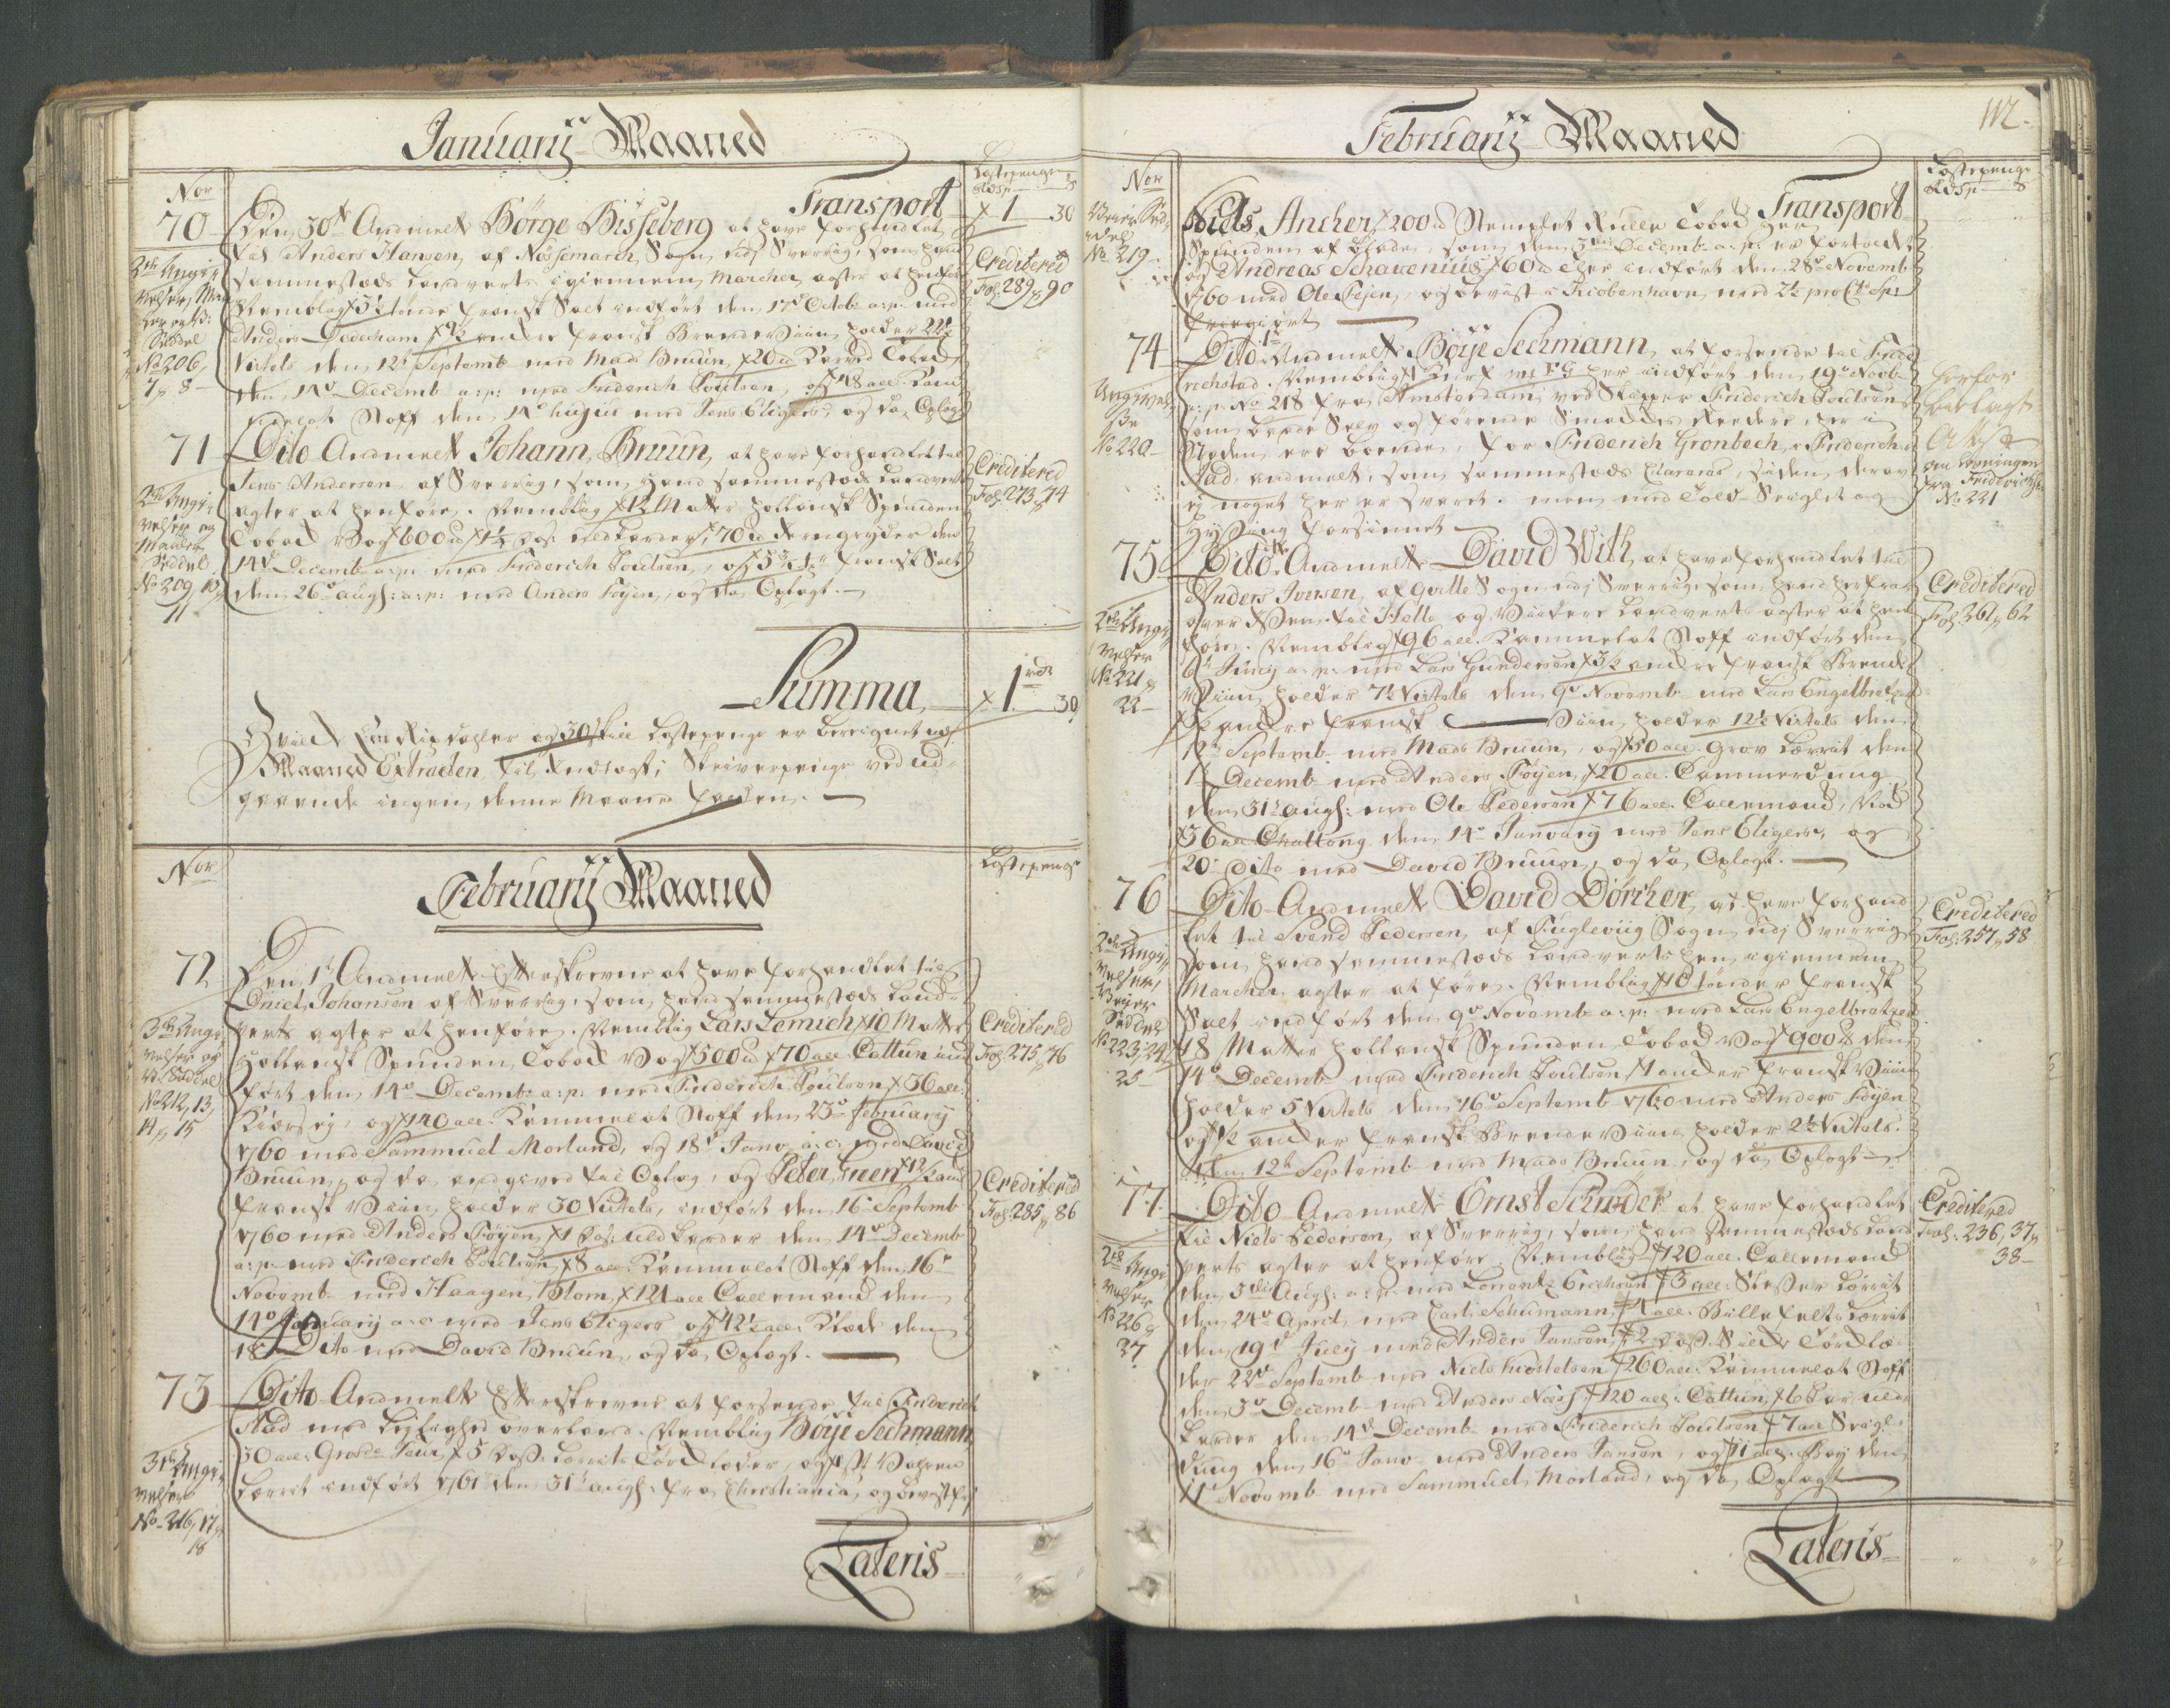 RA, Generaltollkammeret, tollregnskaper, R01/L0046: Tollregnskaper Fredrikshald, 1762, s. 111b-112a